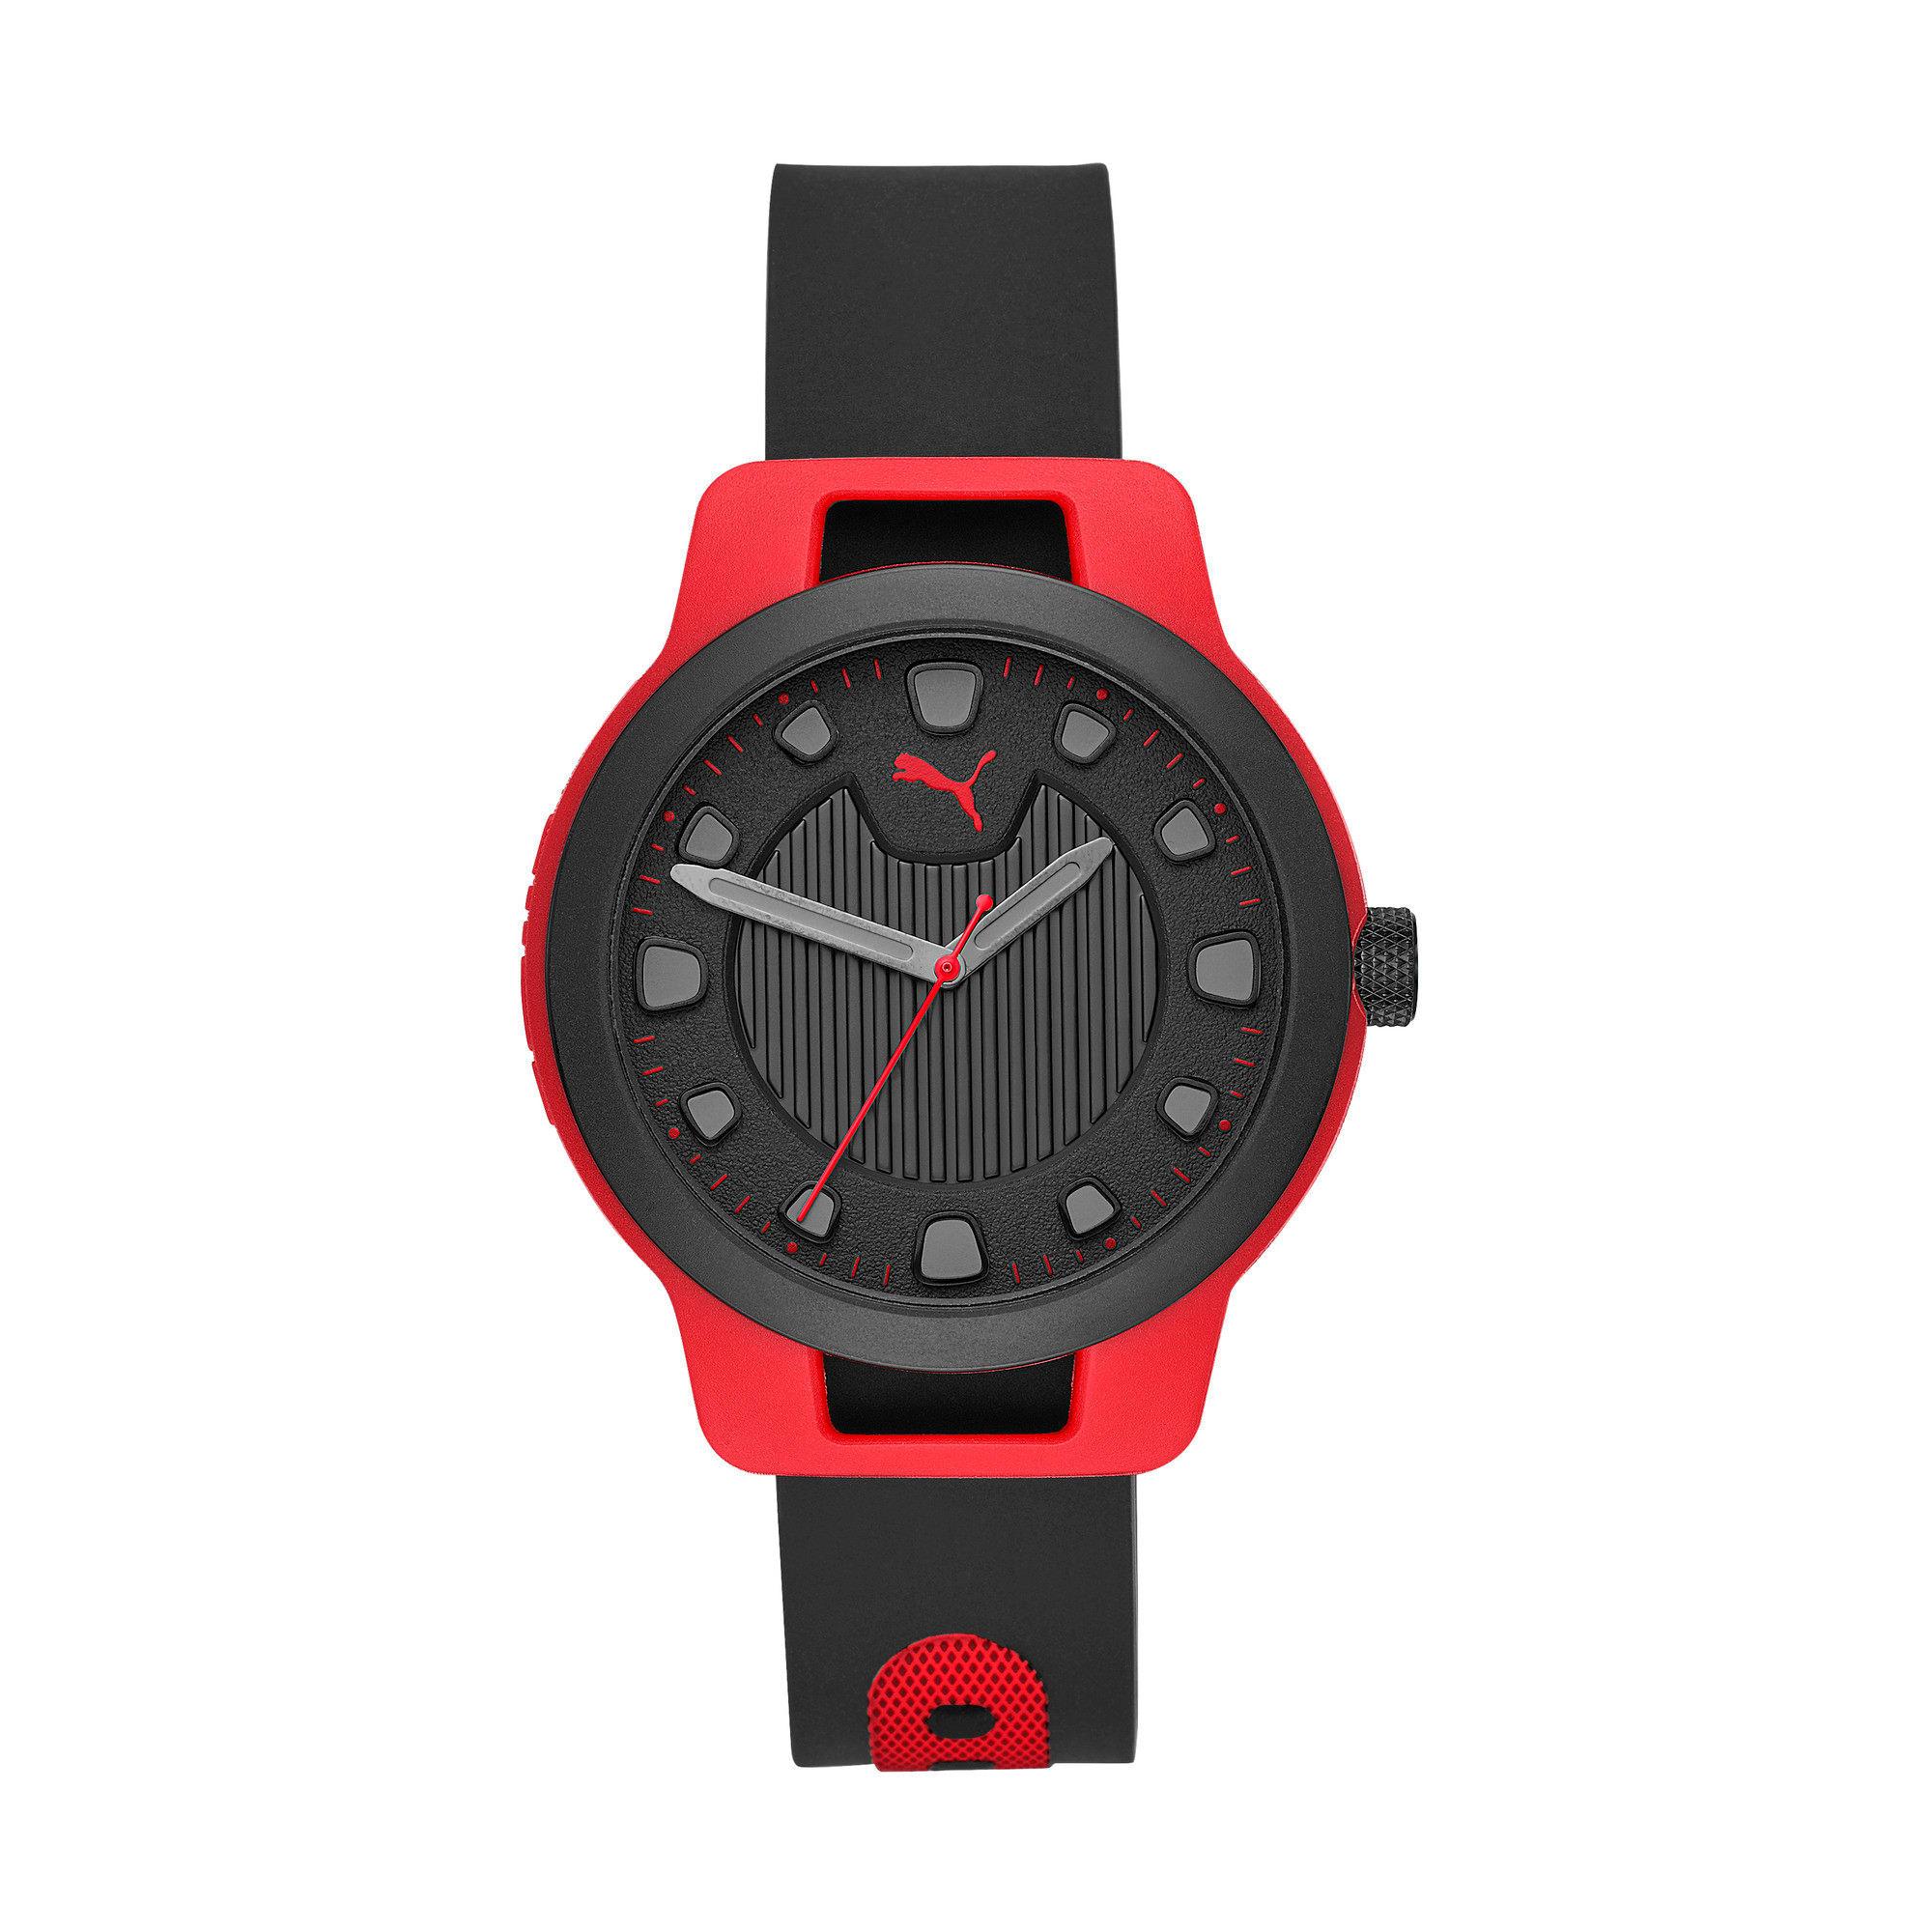 Thumbnail 1 of メンズ リセット シリコン V1  時計, Red/Black, medium-JPN